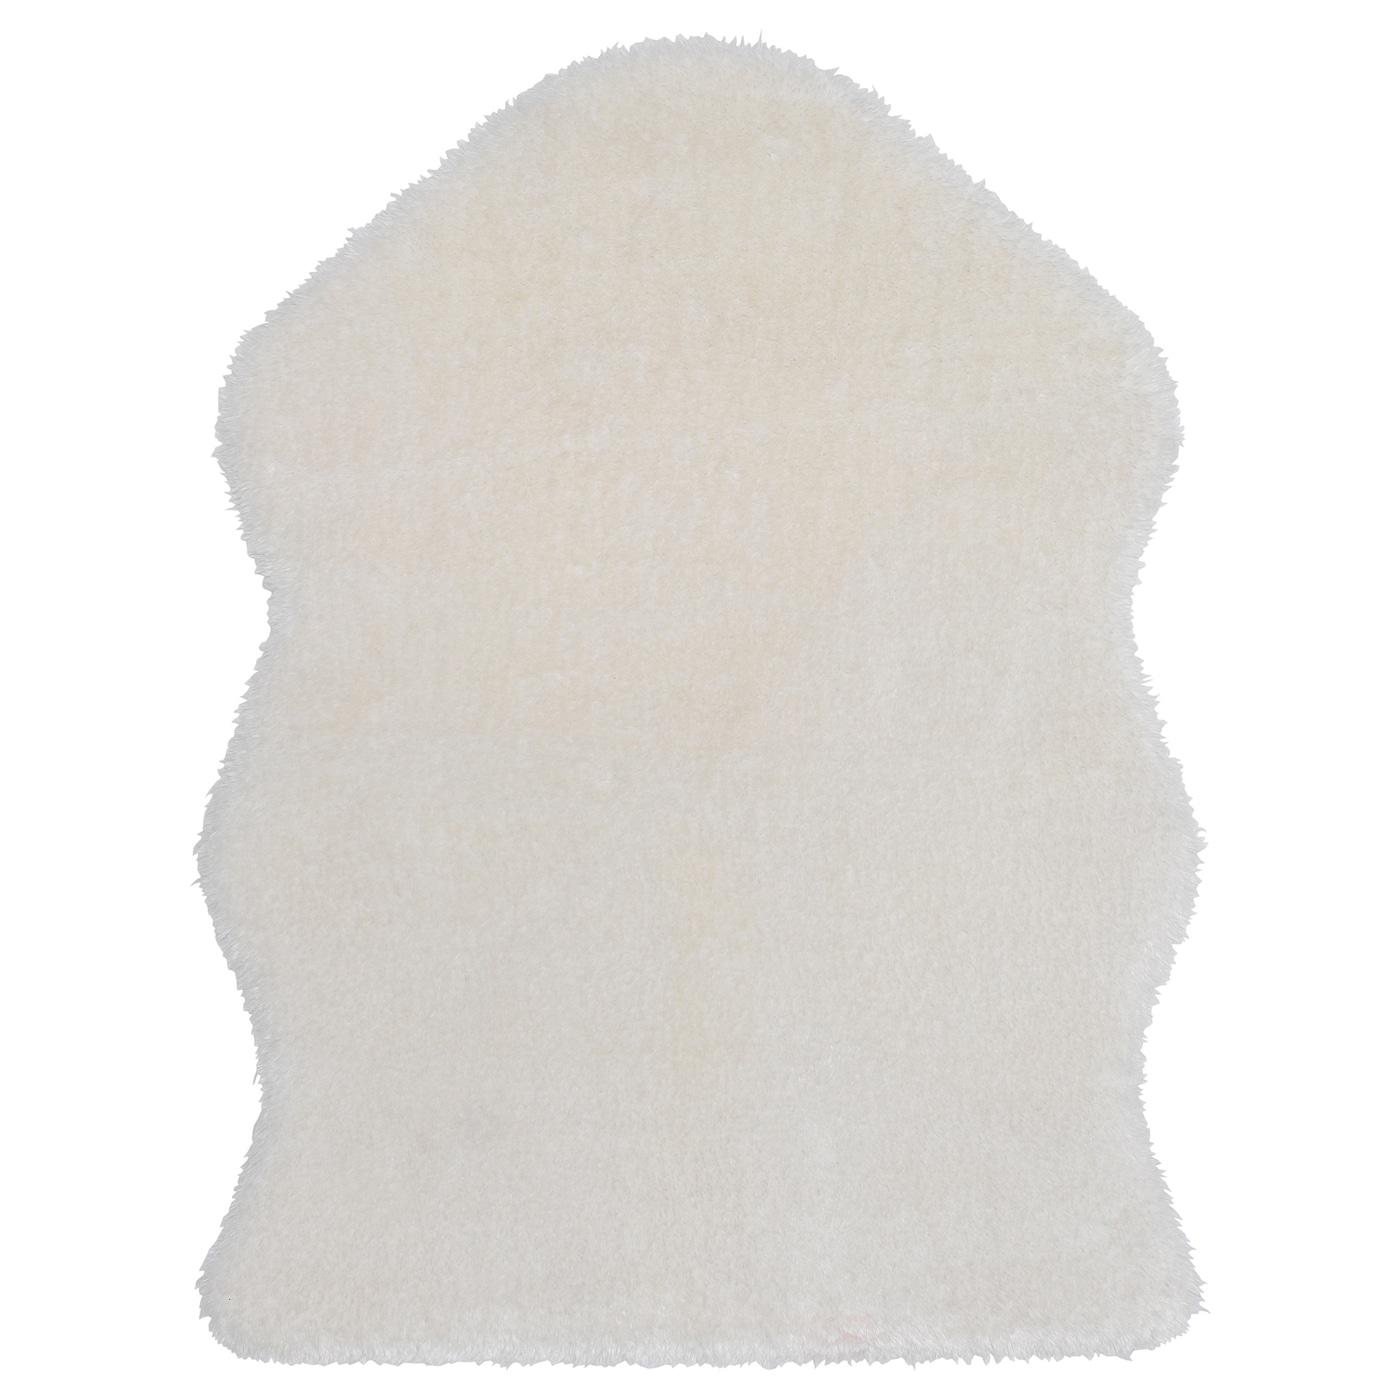 toftlund tapis blanc 90x150 cm